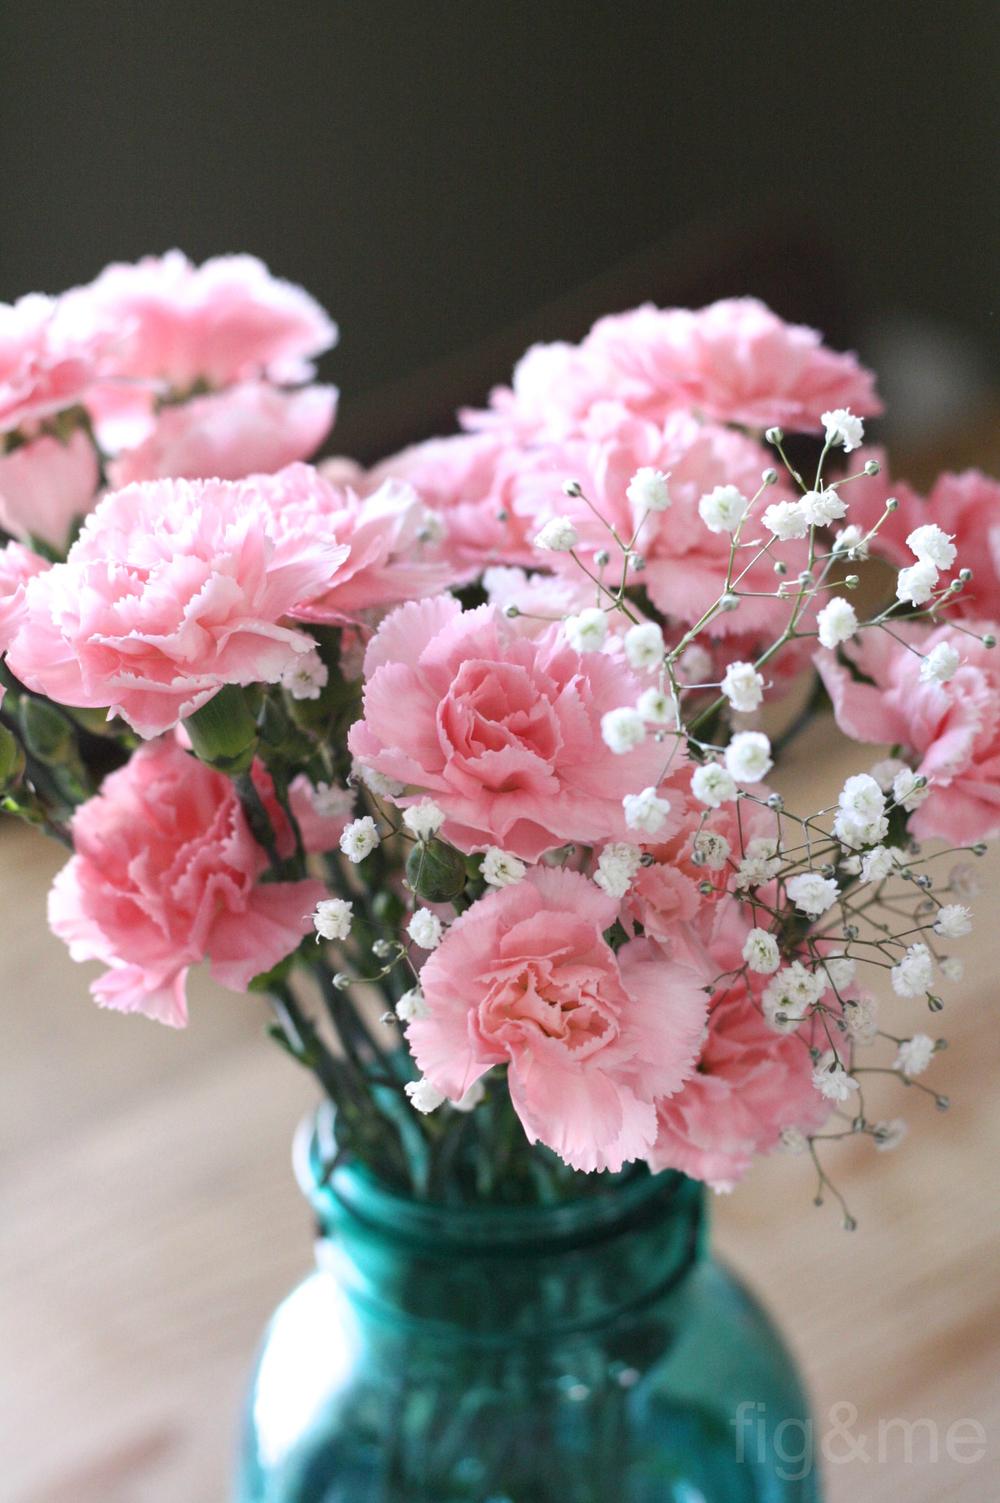 carnationpink.jpg